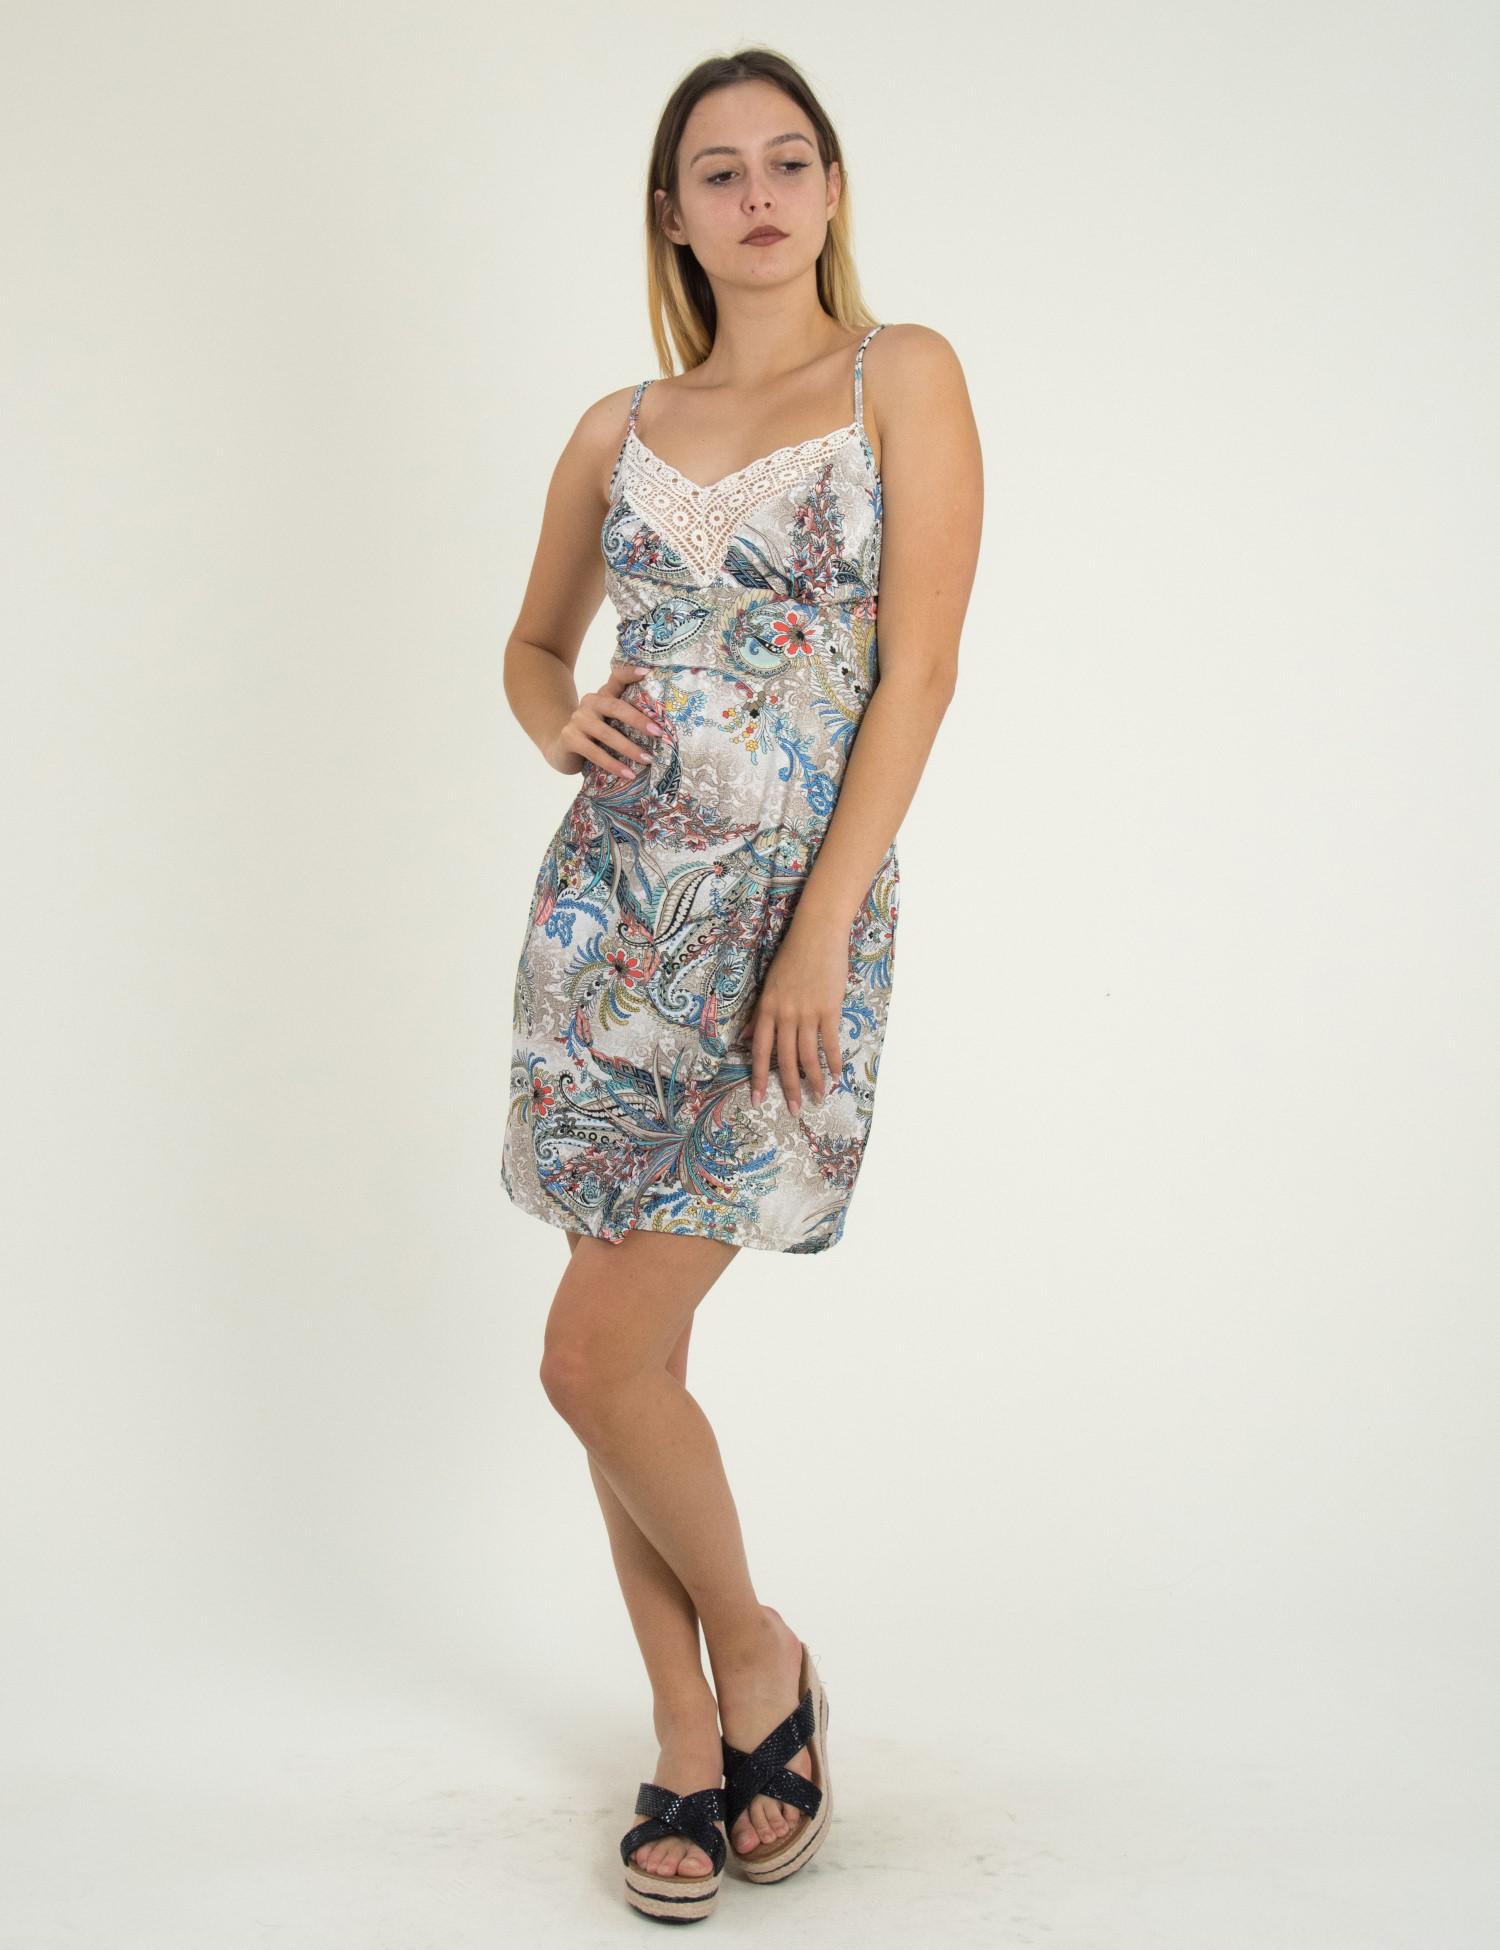 eada9498dfda Γυναικεία   Ρούχα   Φορέματα   Καθημερινά   Maxi φόρεμα με εθνικ ...